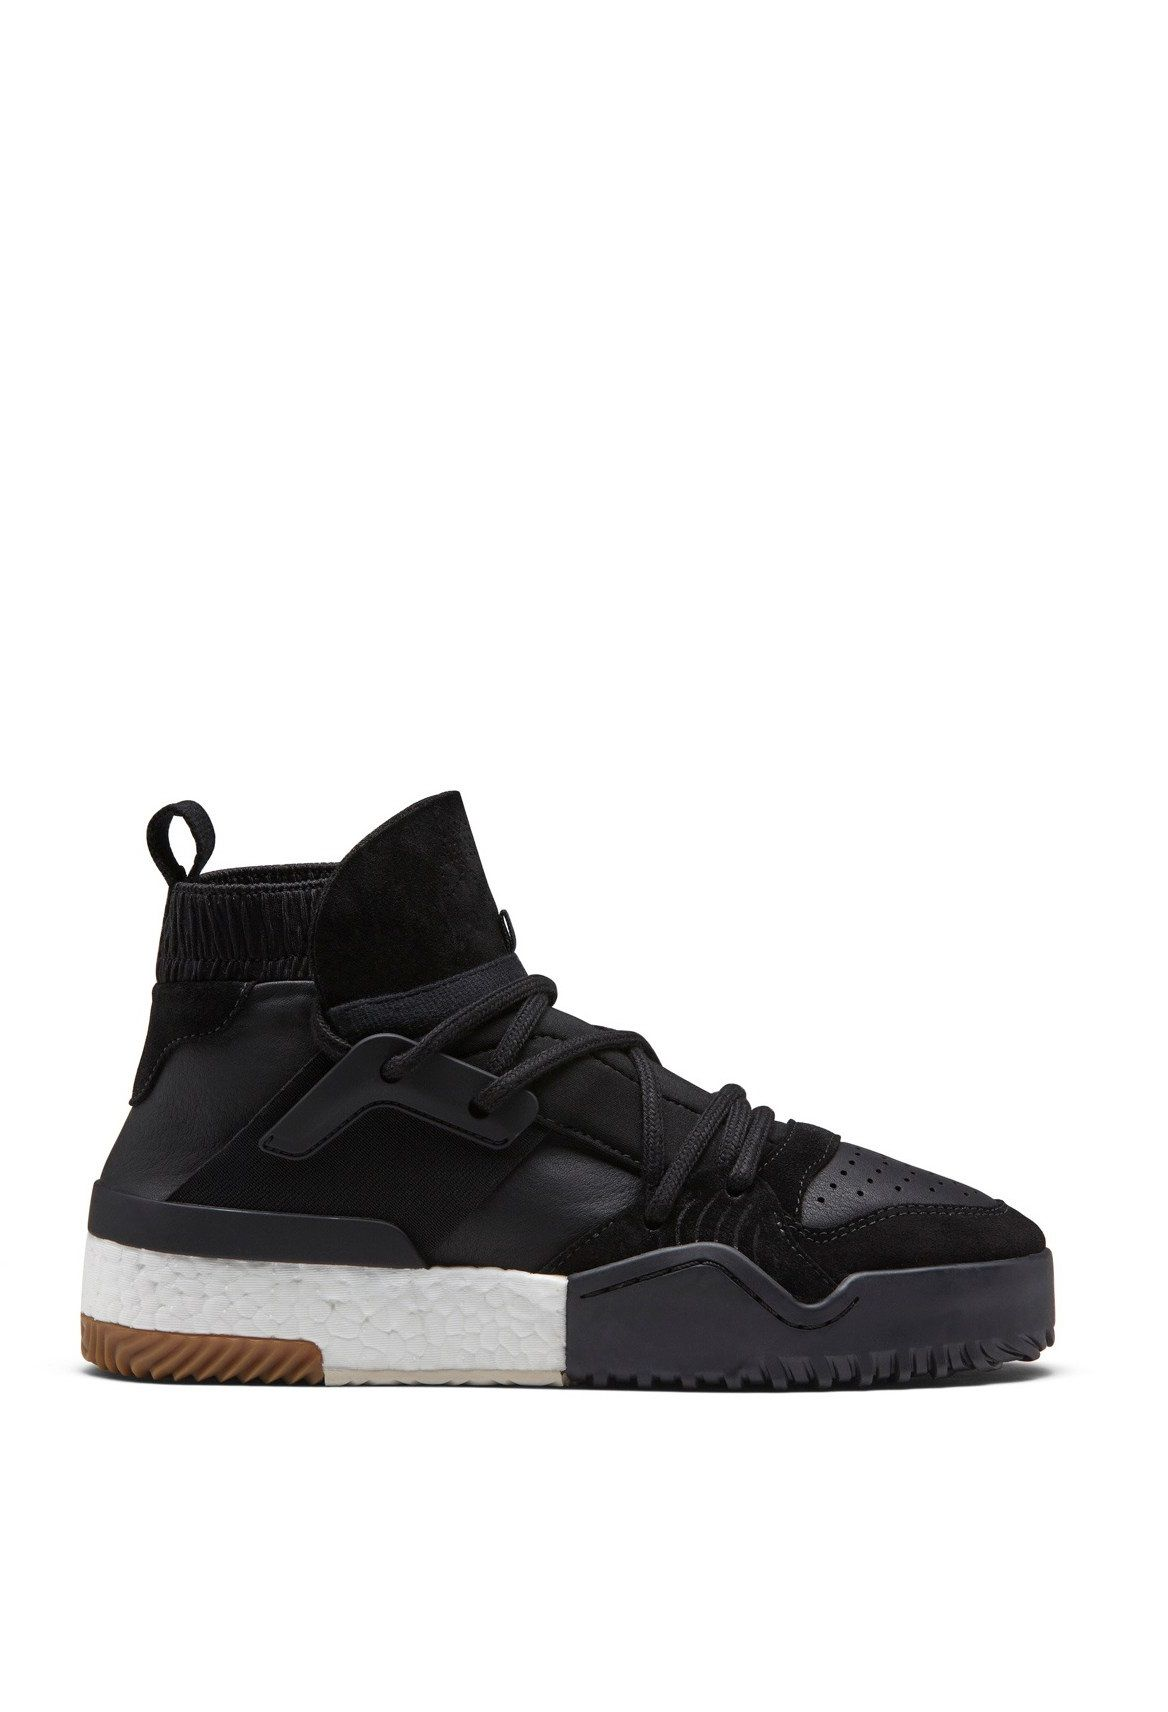 sports shoes fbc2e 4140c Alexander Wangs adidas Originals AW Ball Black Onitsuka Tiger, Asics,  Reebok, Pumas